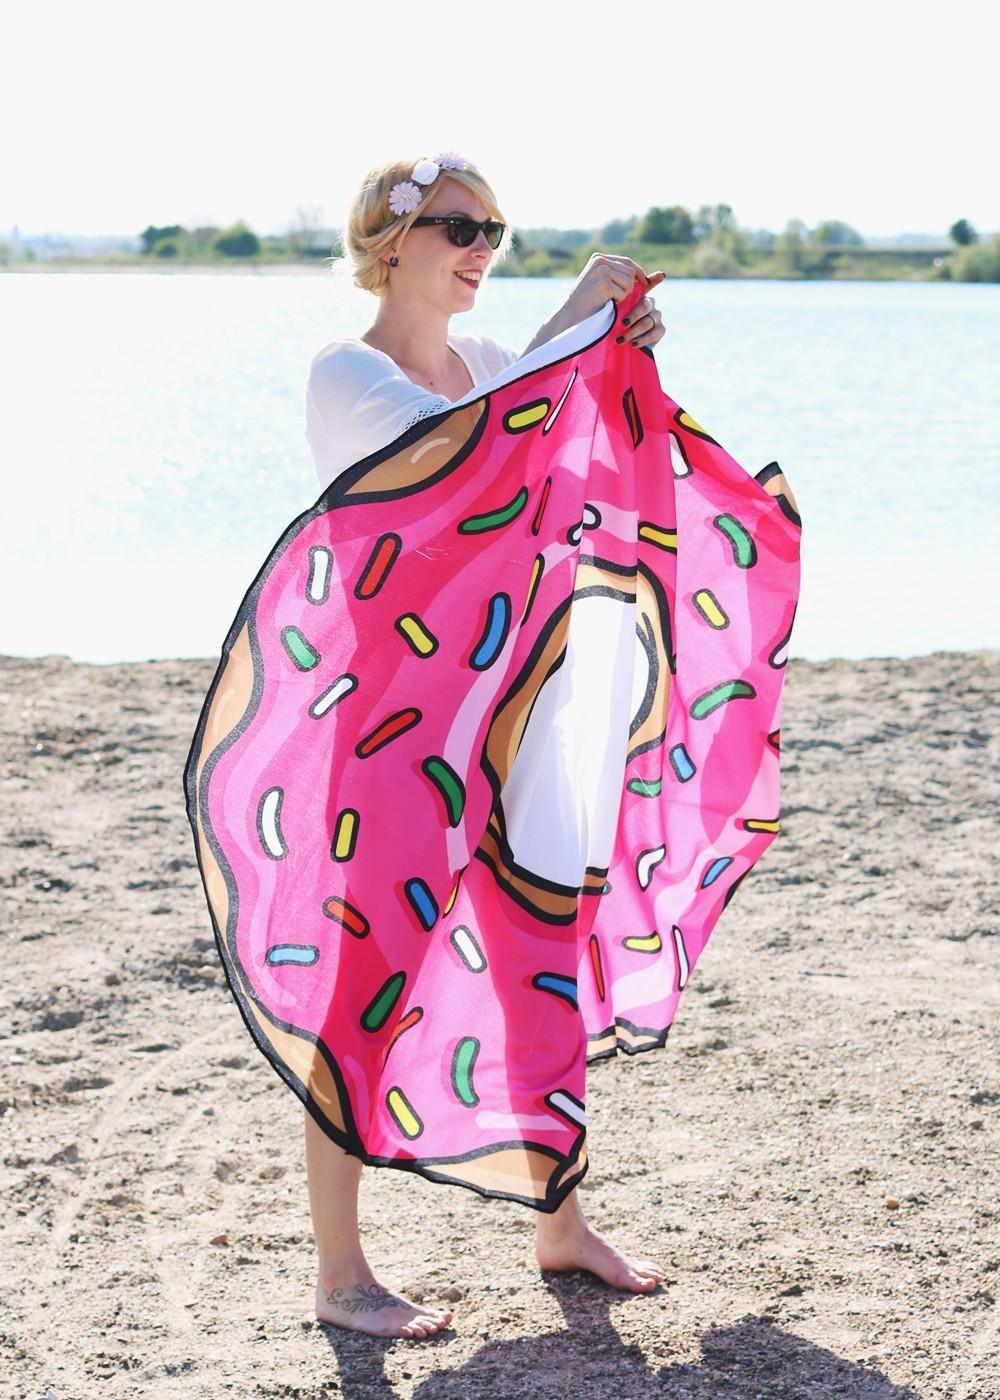 Flamingoschwimmring Donutstrandtuch Accessoires See Strand Radbag (4)